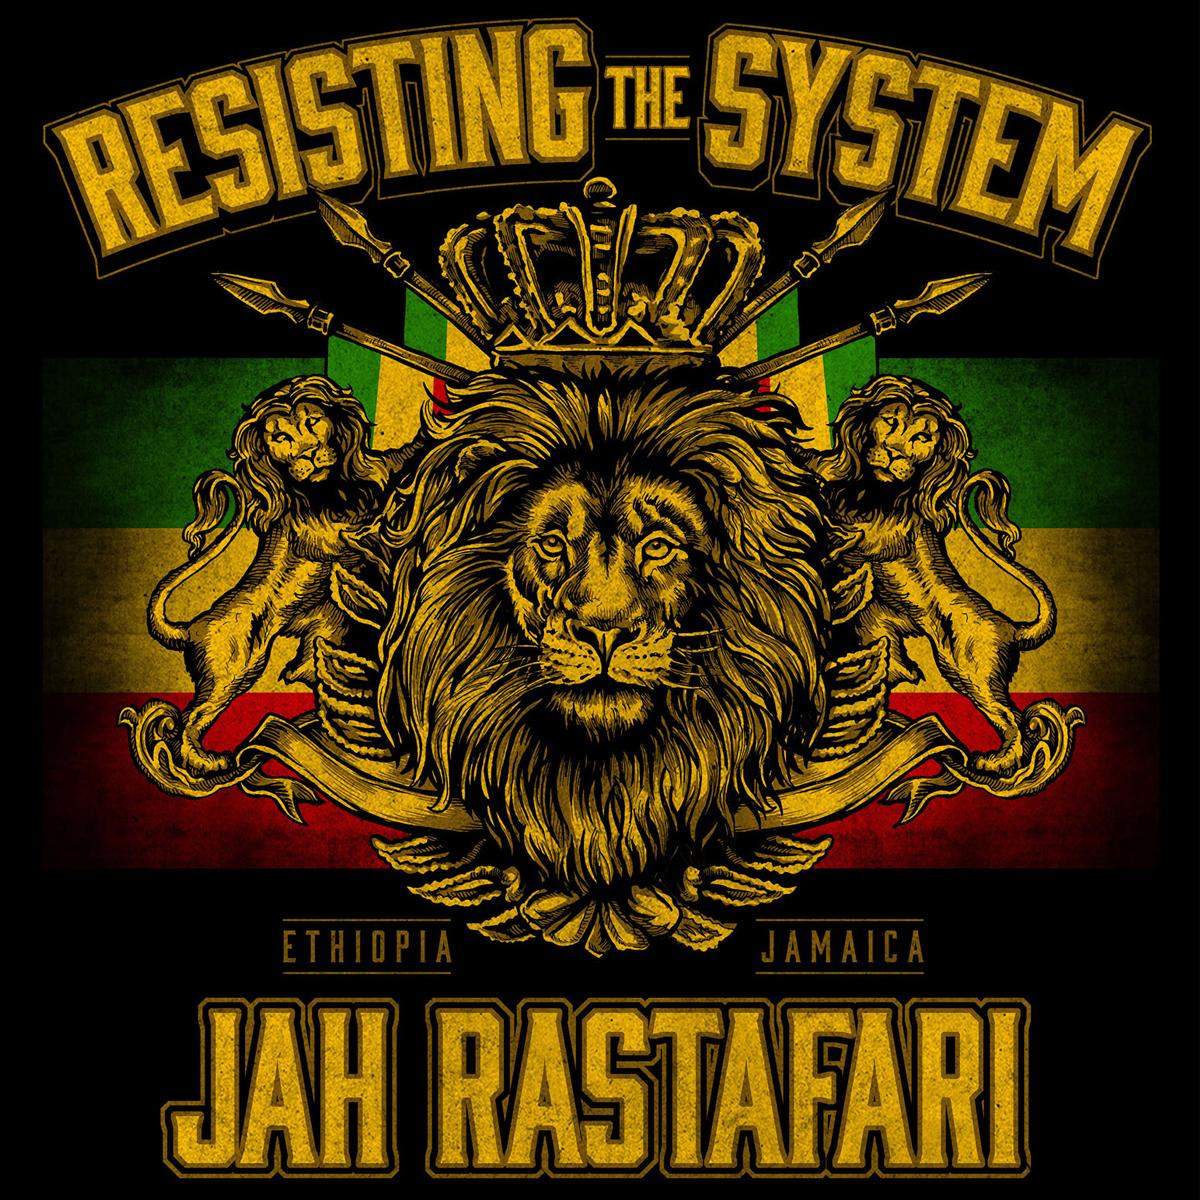 Rastafarian 2: RastaEmpire Resisting The System Black T-Shirt